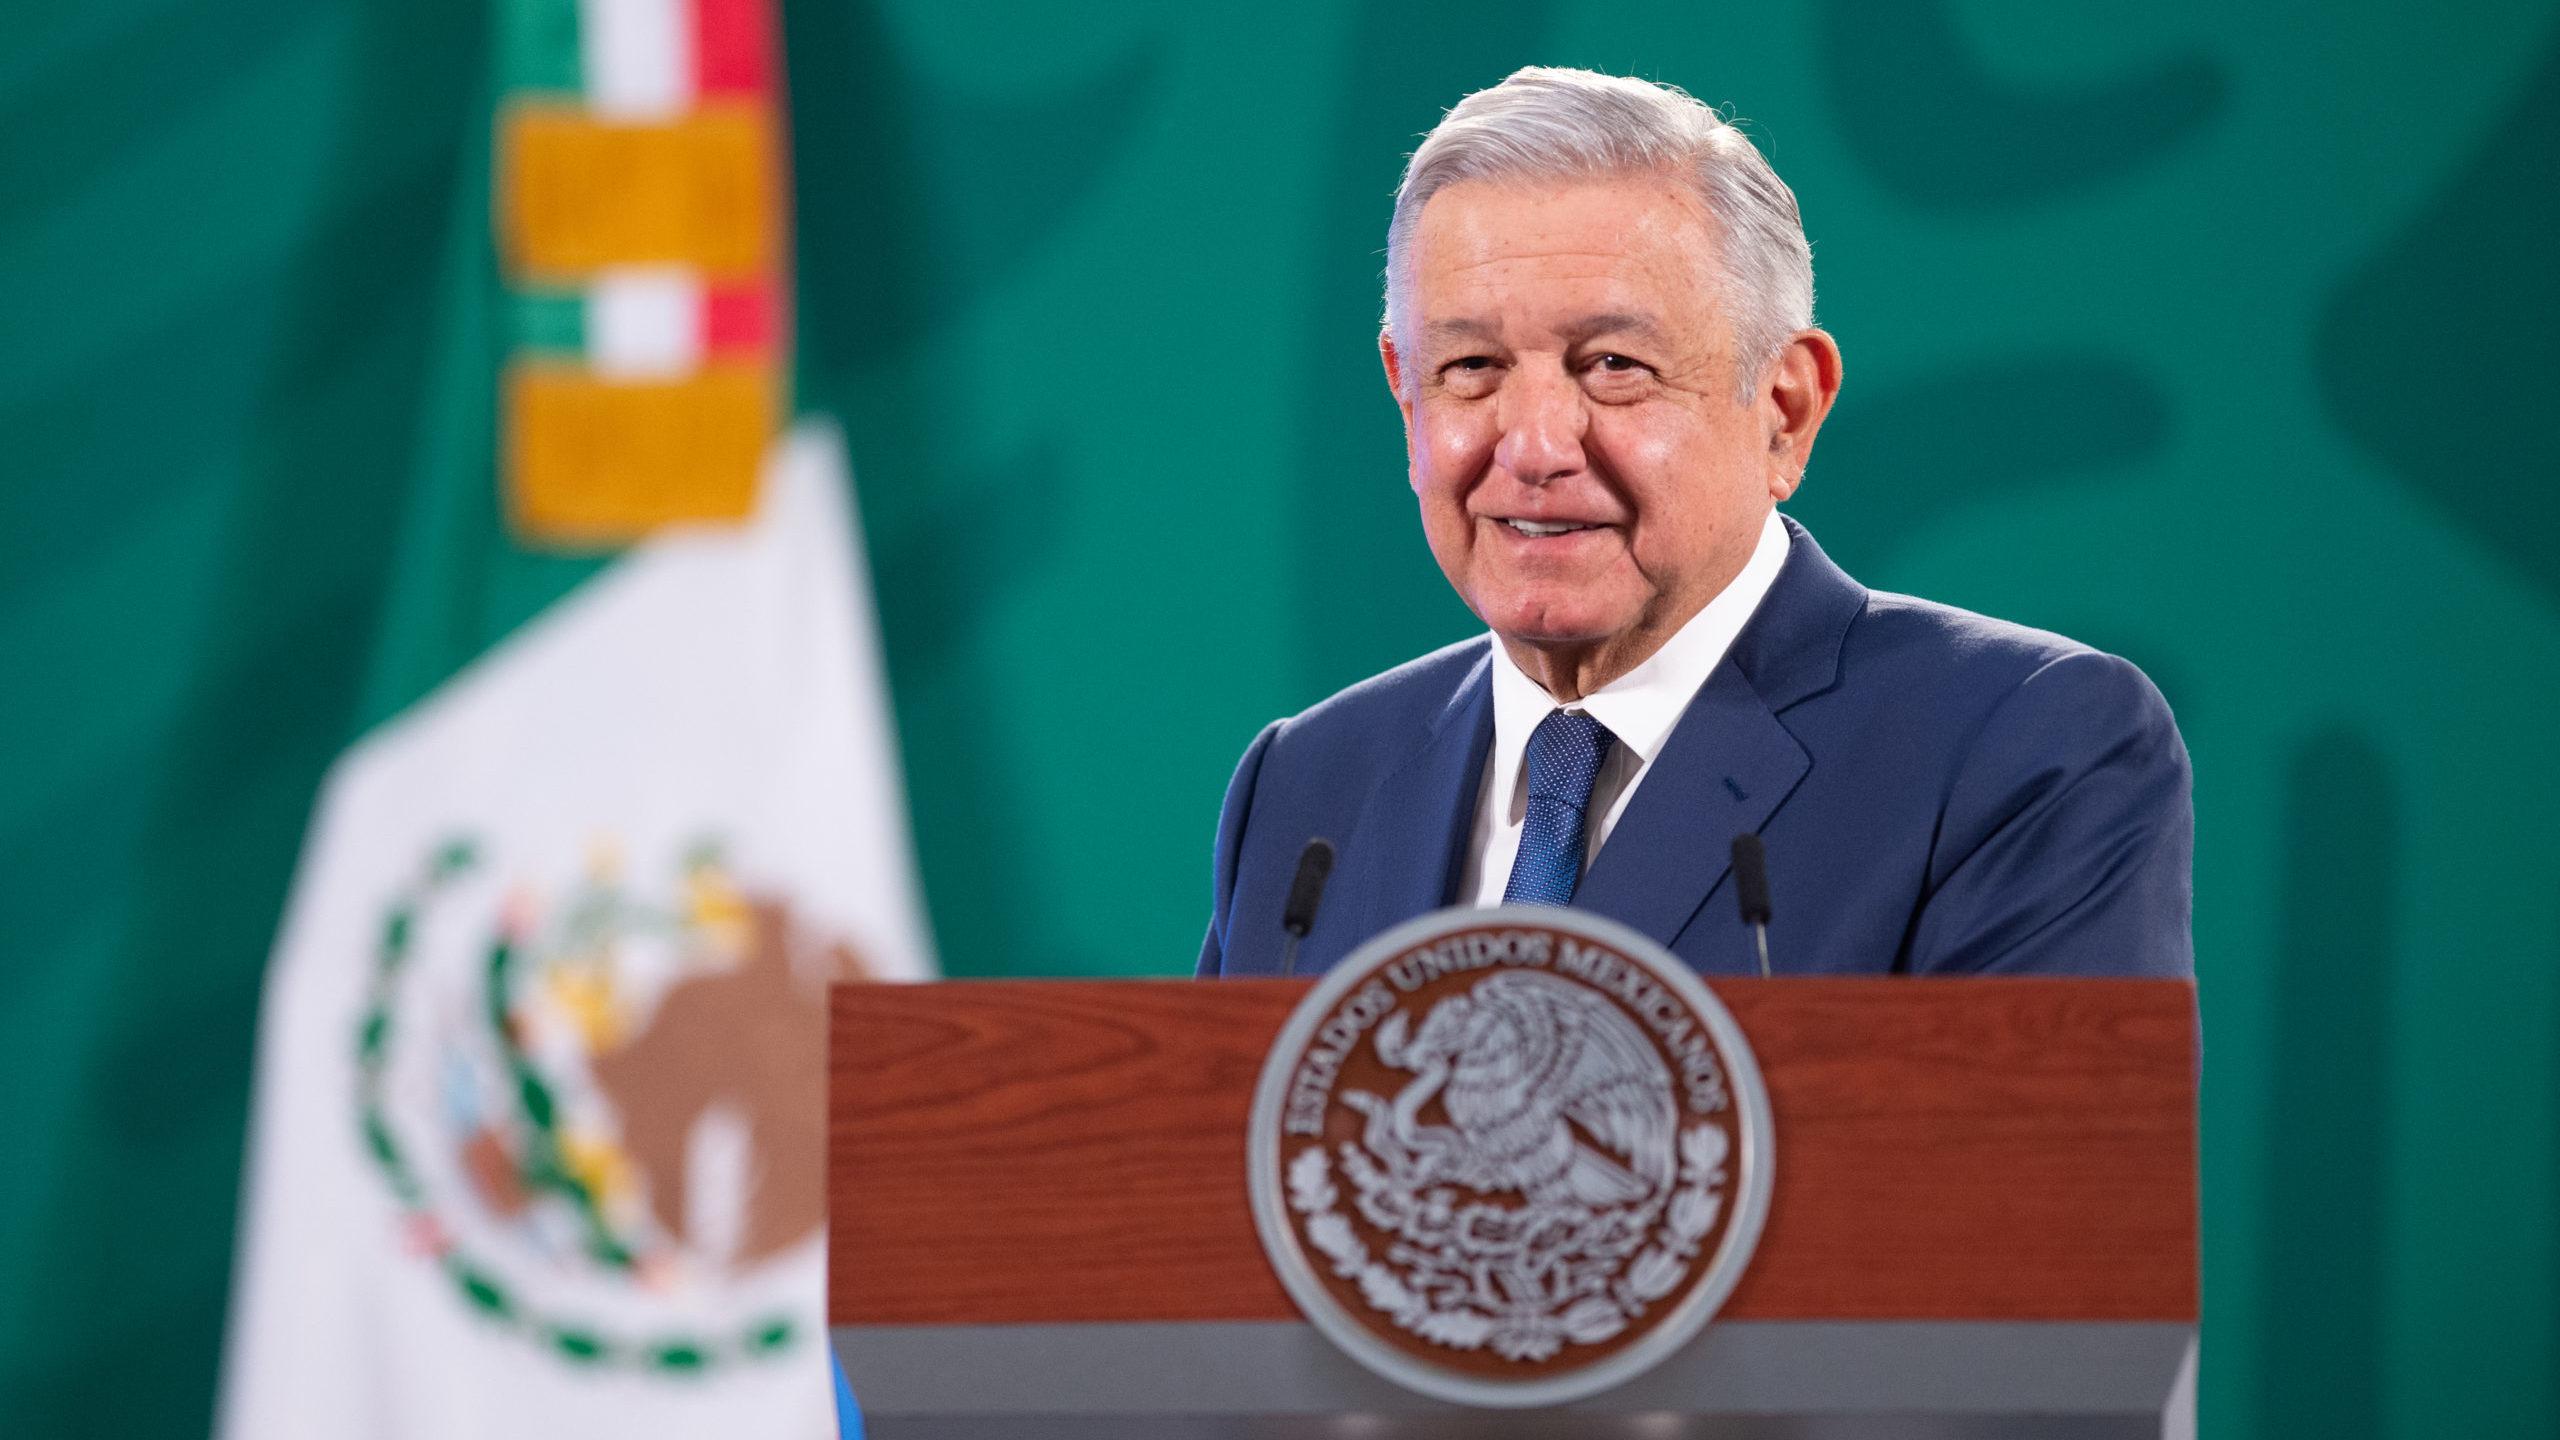 AMLO iniciará giras en 2021 en estados con elecciones para gubernaturas